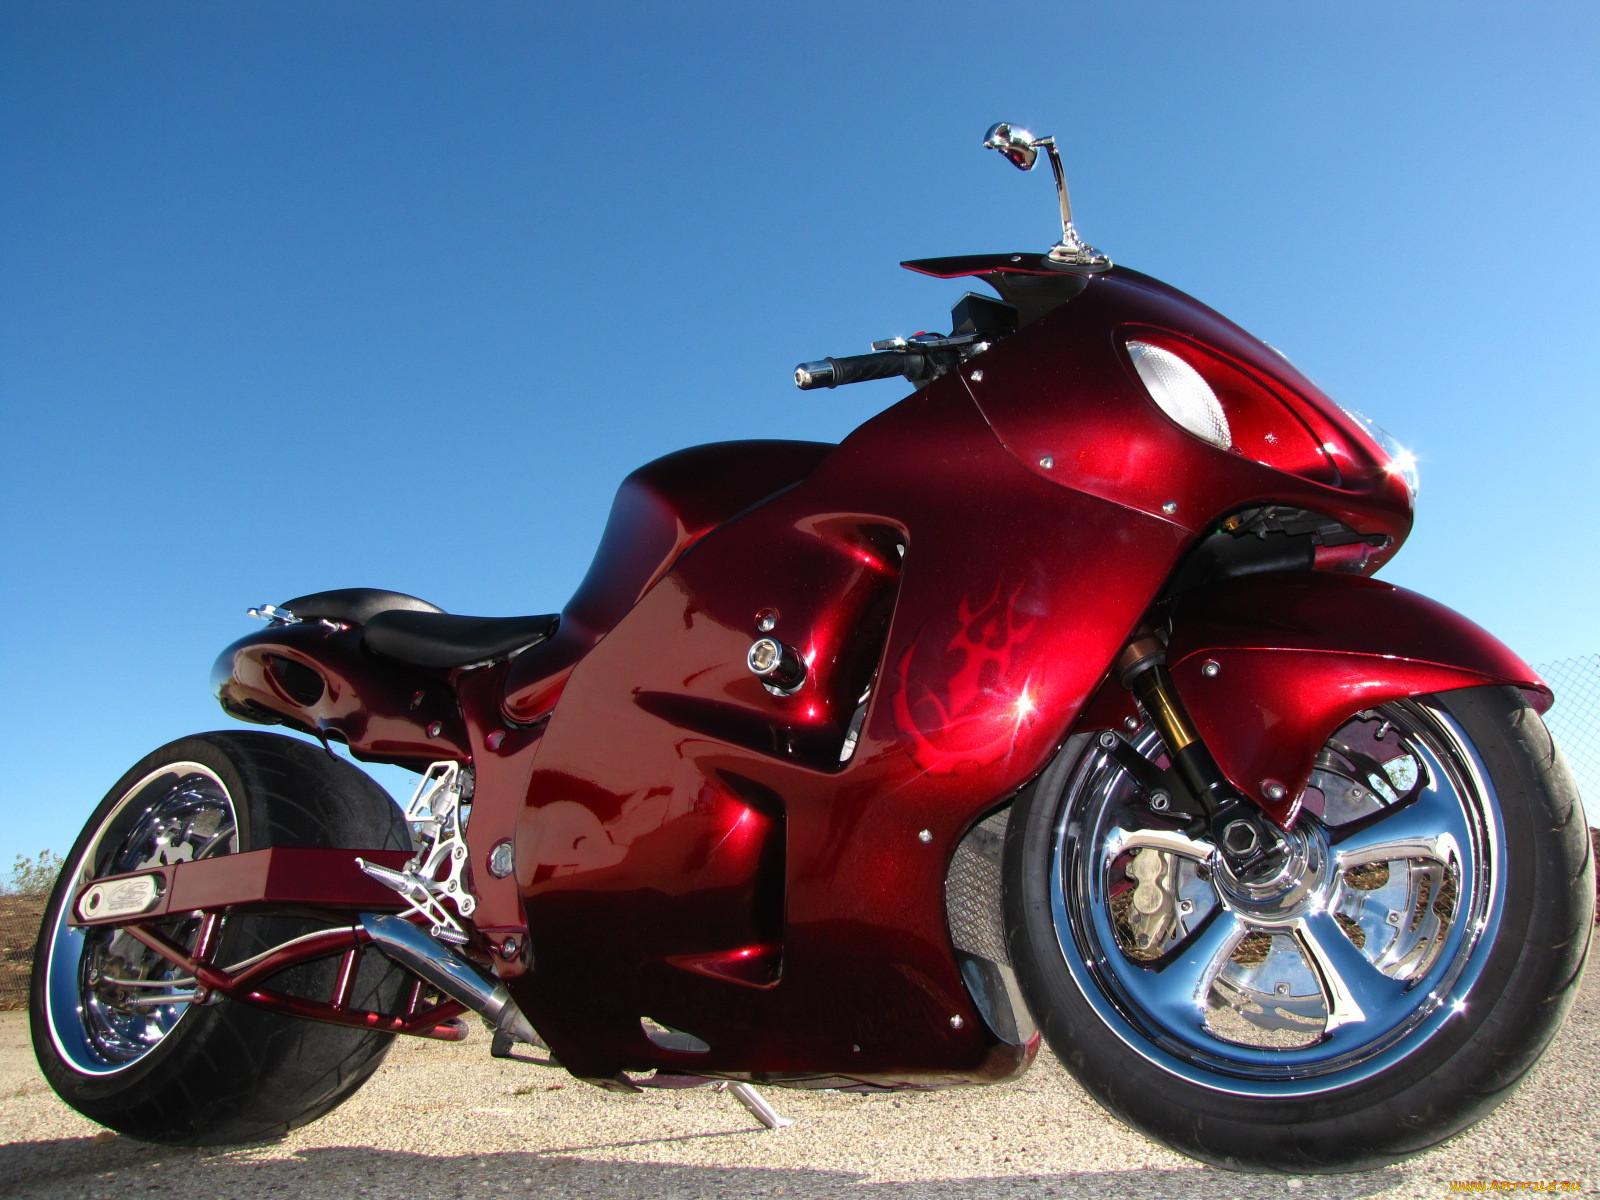 фото крутых тачек и мотоциклов госдуме